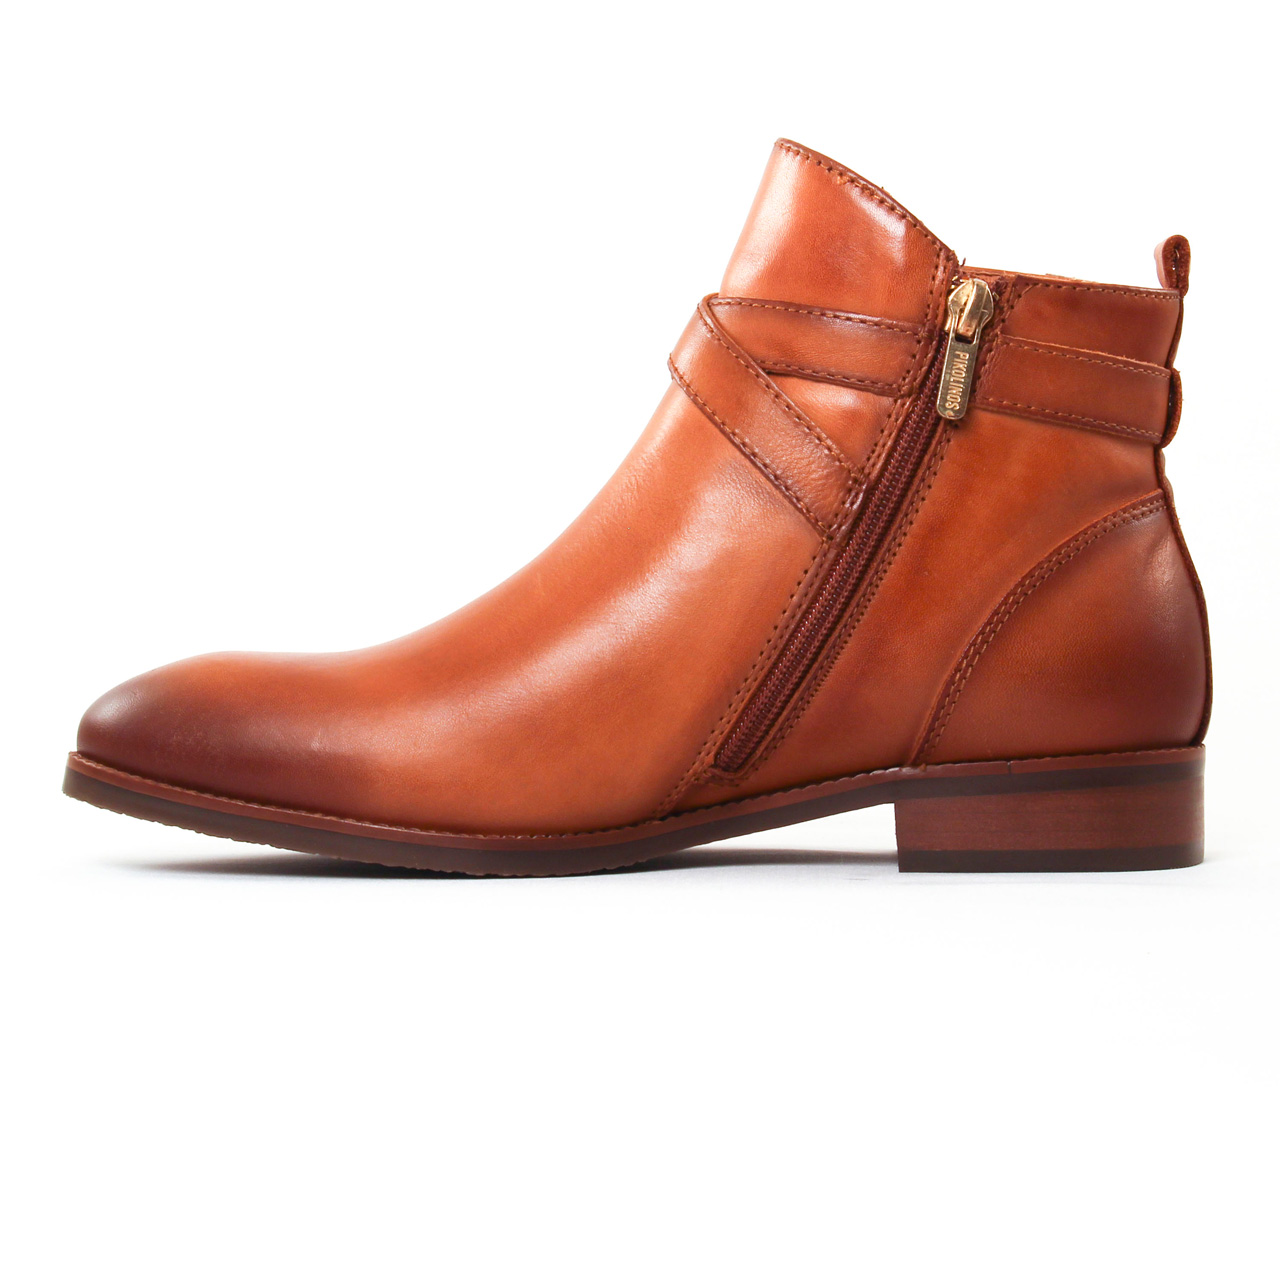 Pikolinos Bottes pour Femme - Marron - Brandy Sgn Chaussures escarpins GIANCARLO PAOLI Sgn soldes qrXYwaAySq,